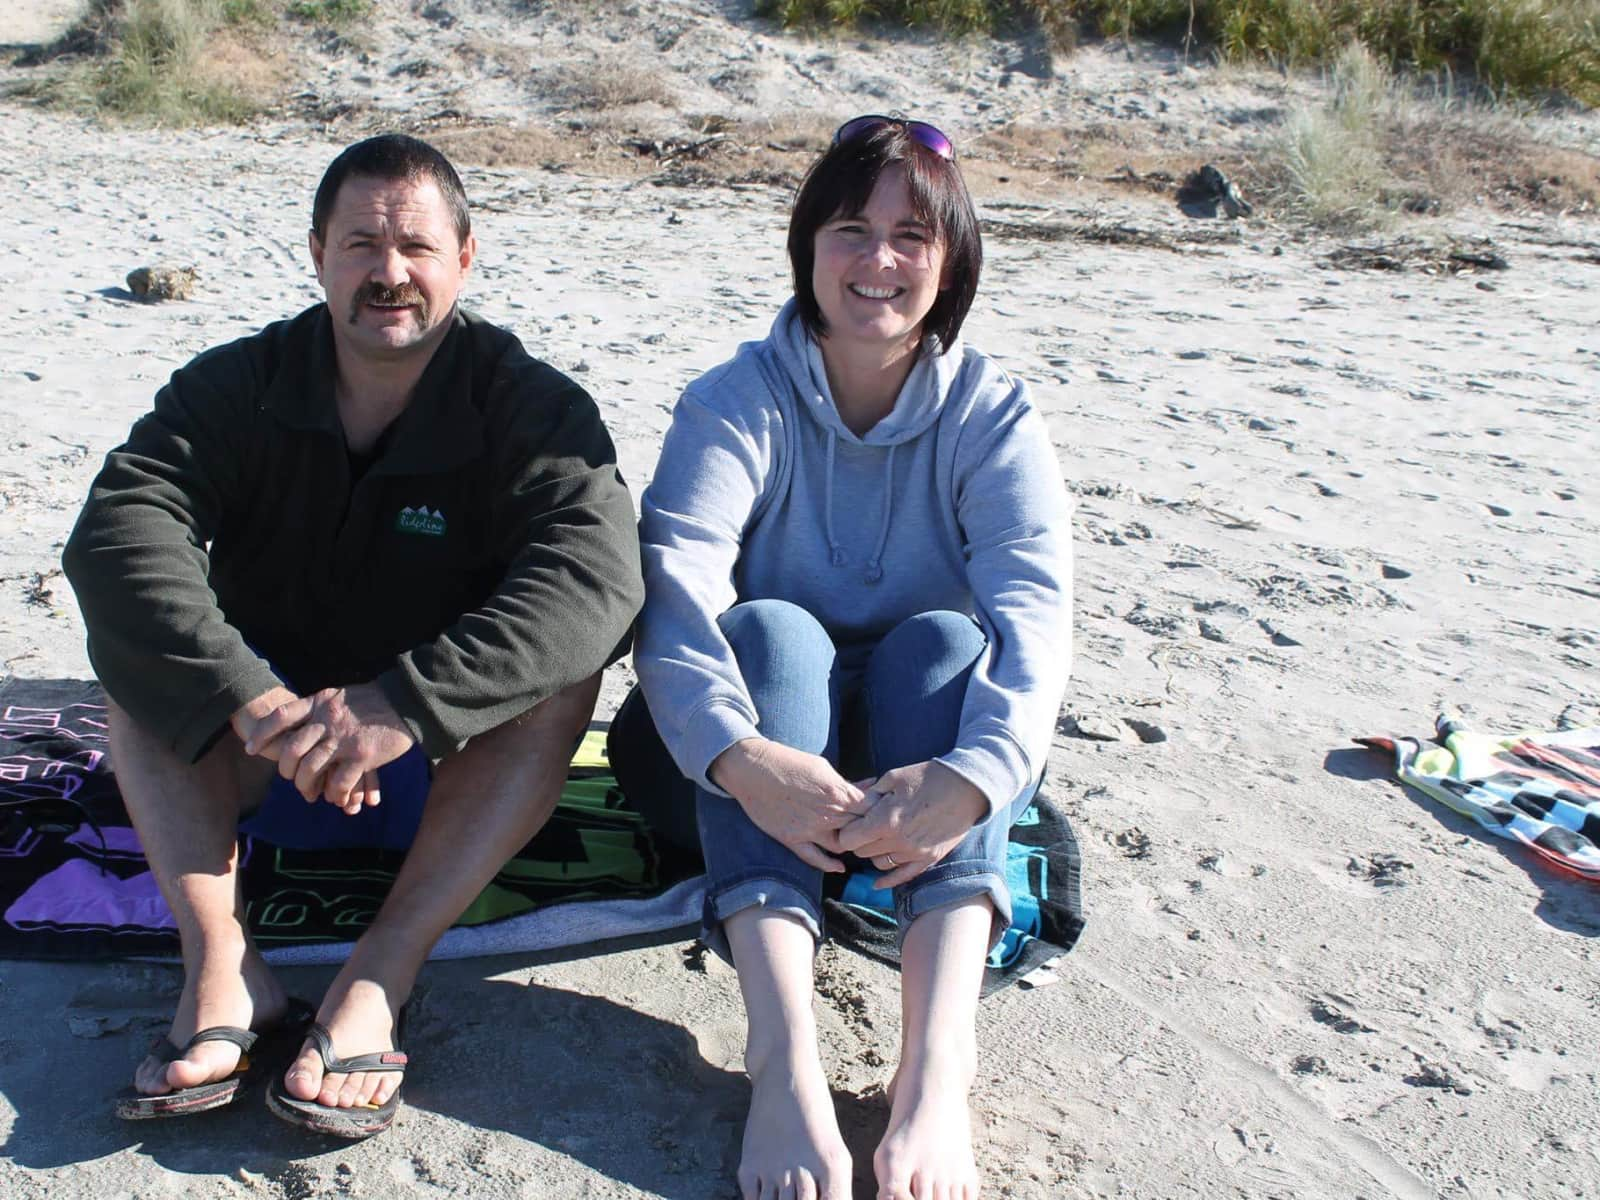 James & Sarah from Wallingford, United Kingdom